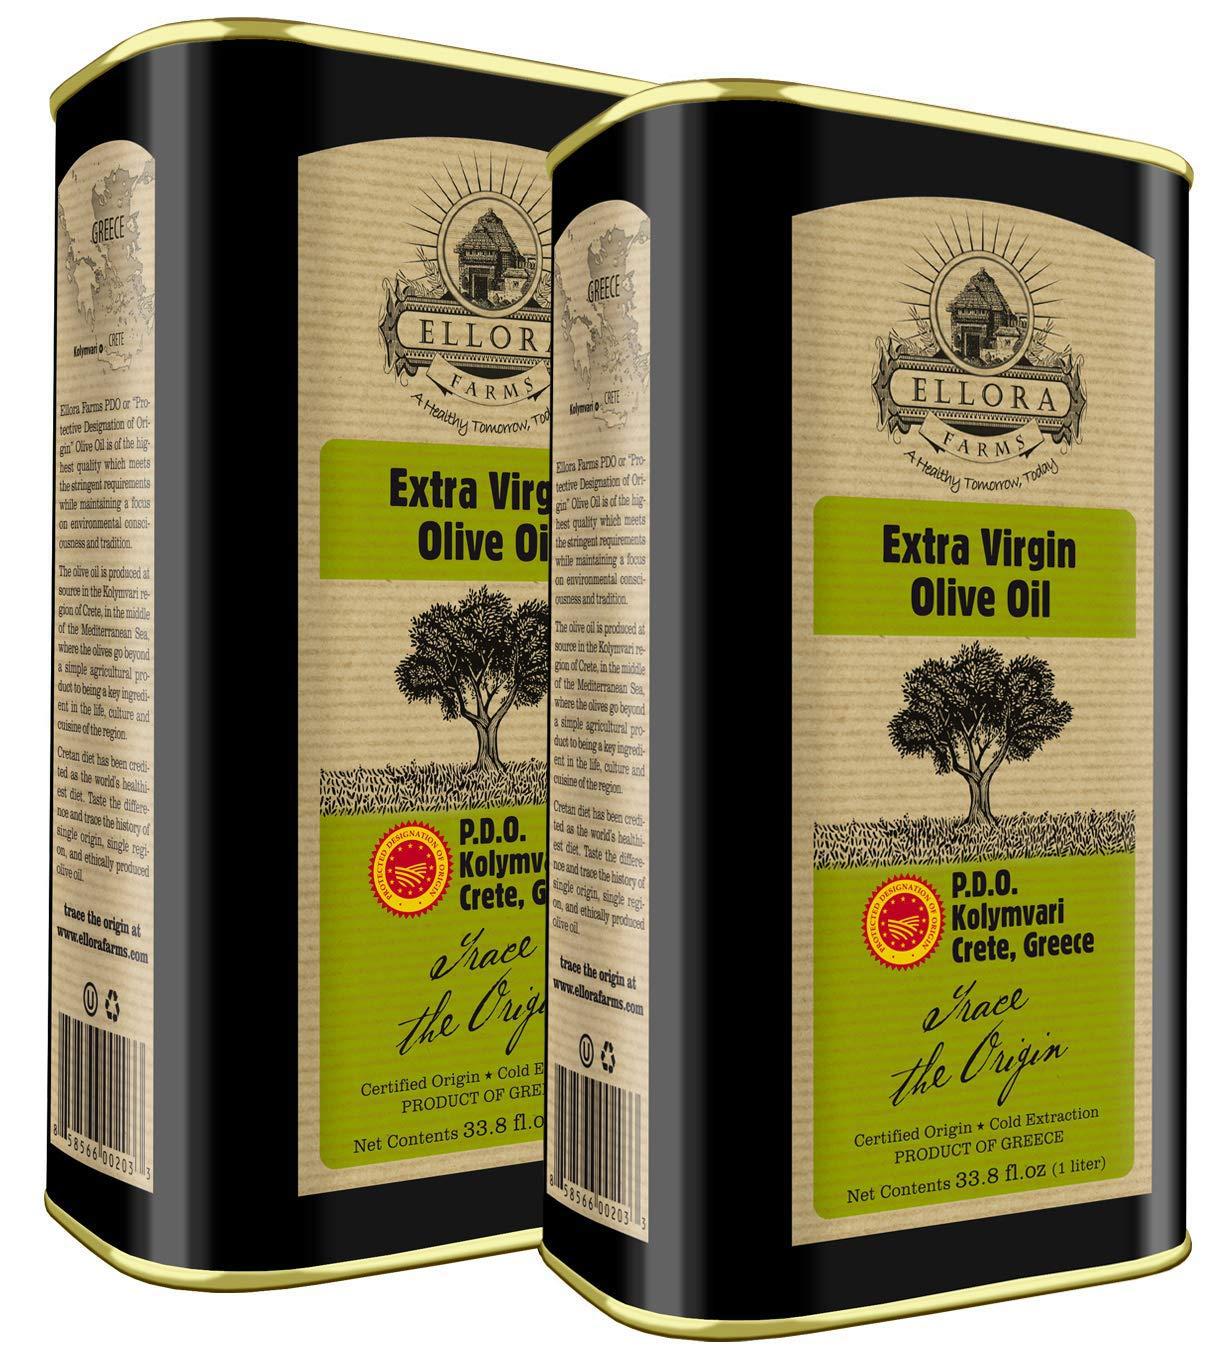 Global Award Winner   Single Estate Greek Extra Virgin Olive Oil   Kosher & Certified PDO Kolymvari   Single Variety Koroneiki Olives   First Cold Press   1Ltr. Tin, 33.8 FL oz.   Pack of 2 by Ellora Farms